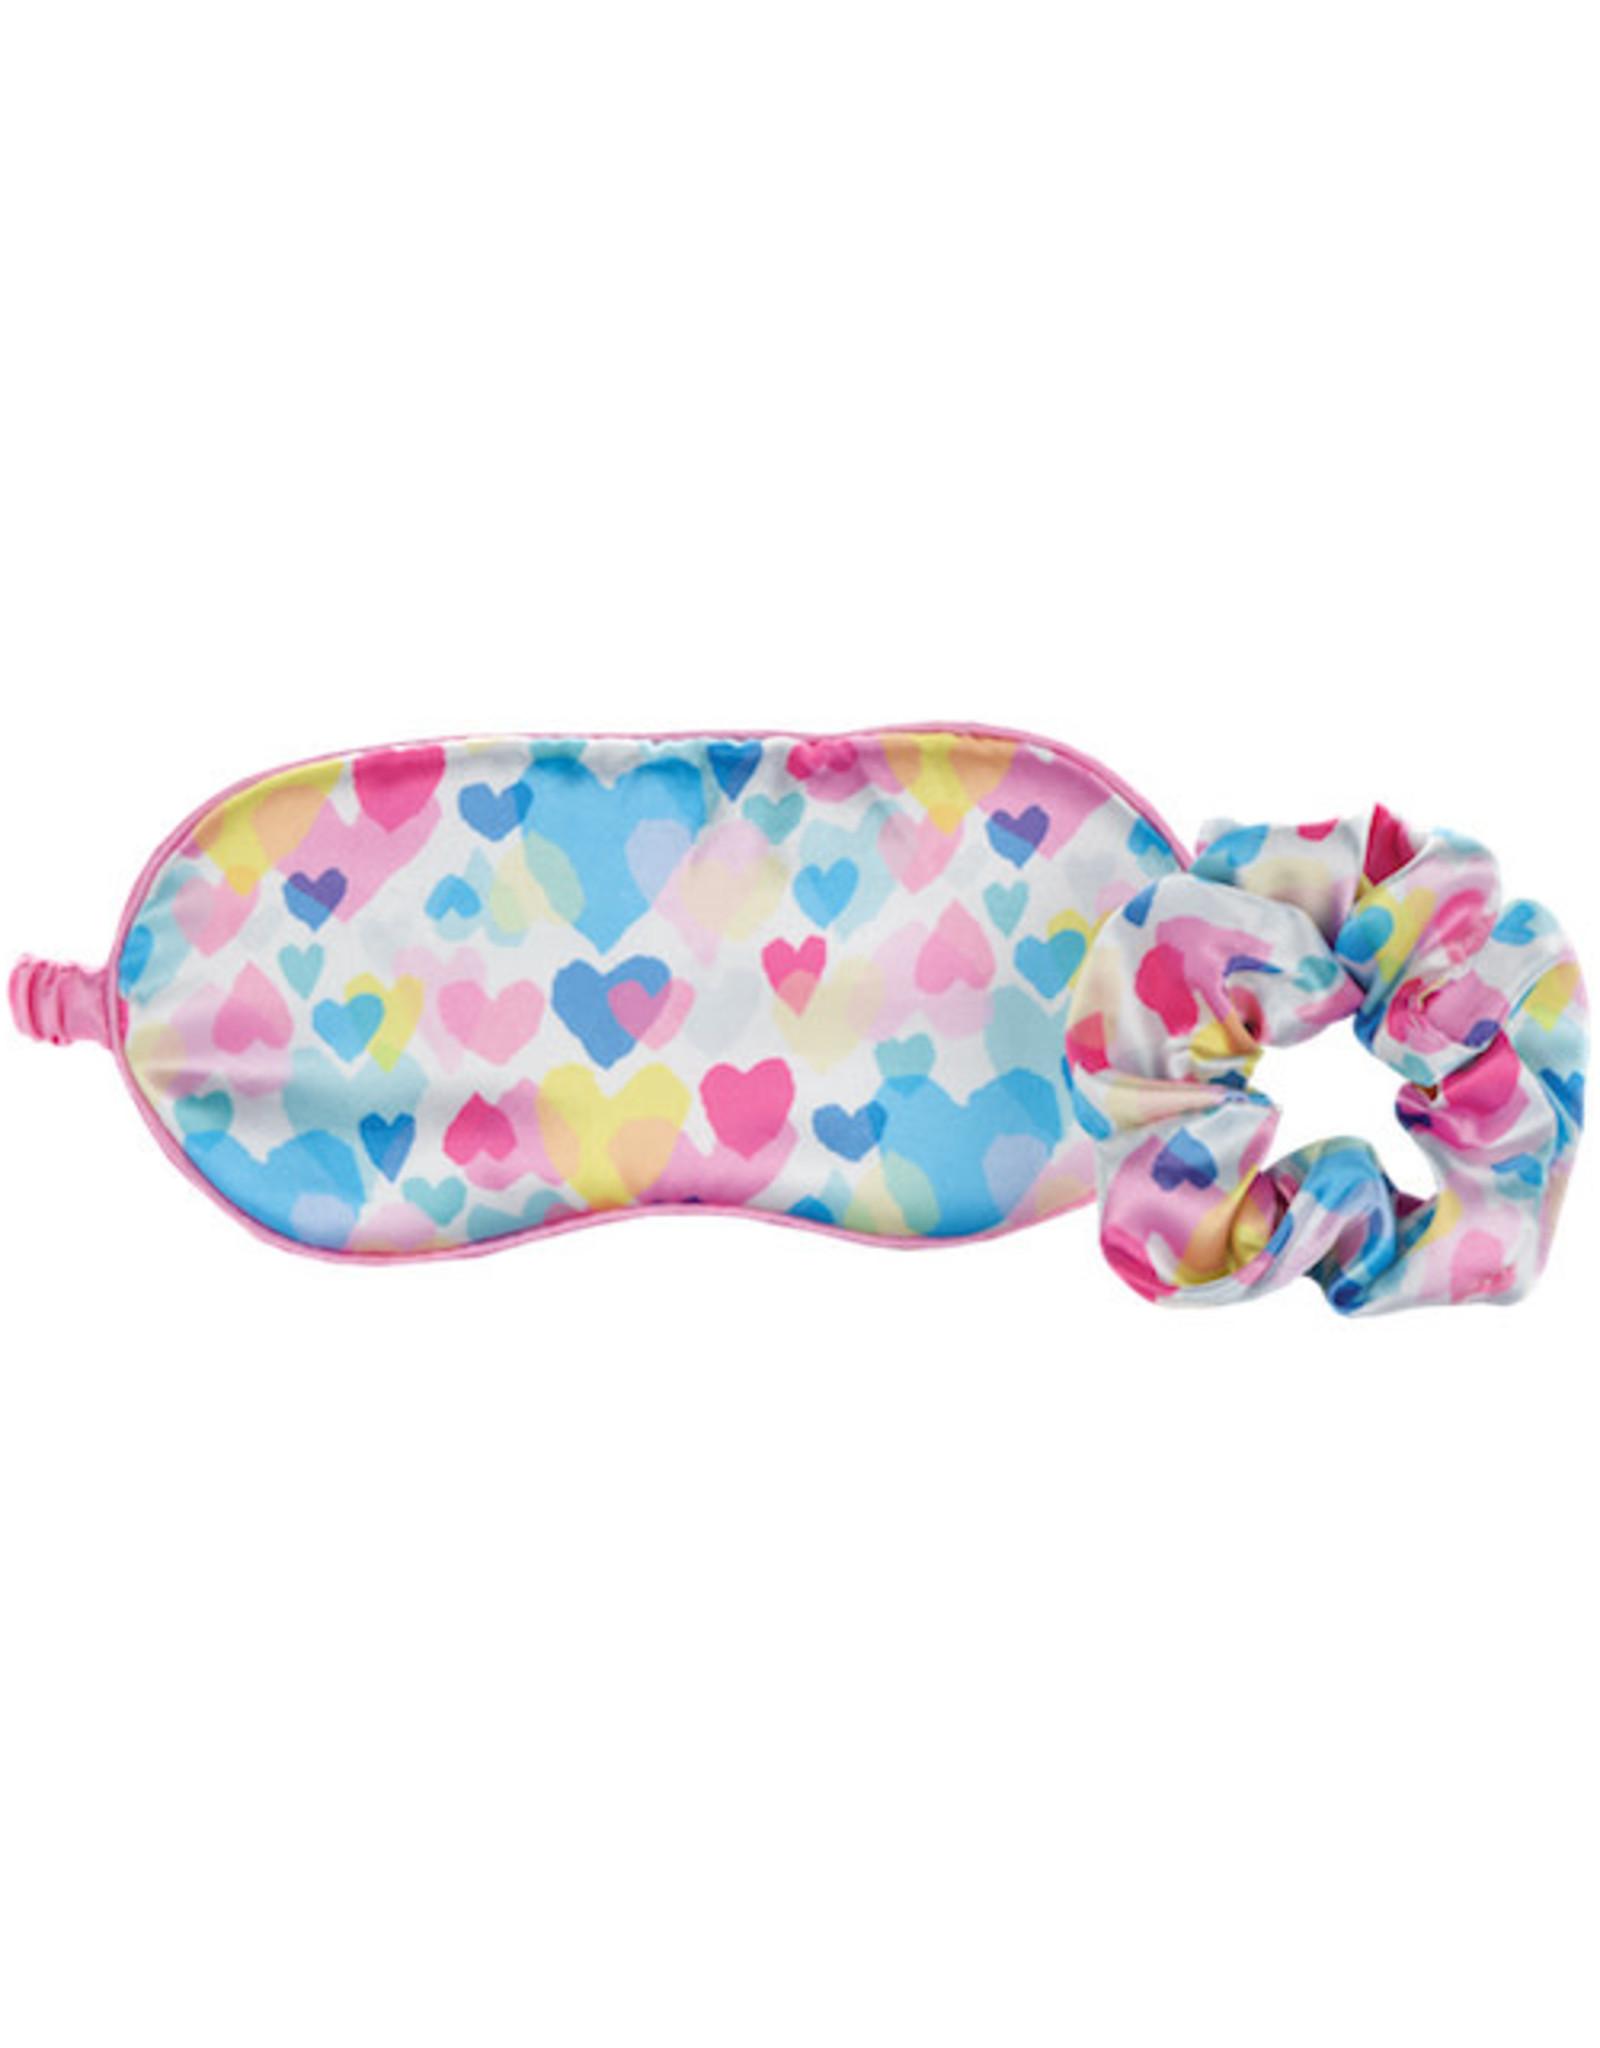 Iscream Pastel Hearts Silk Eye Mask / Scrunchie Set